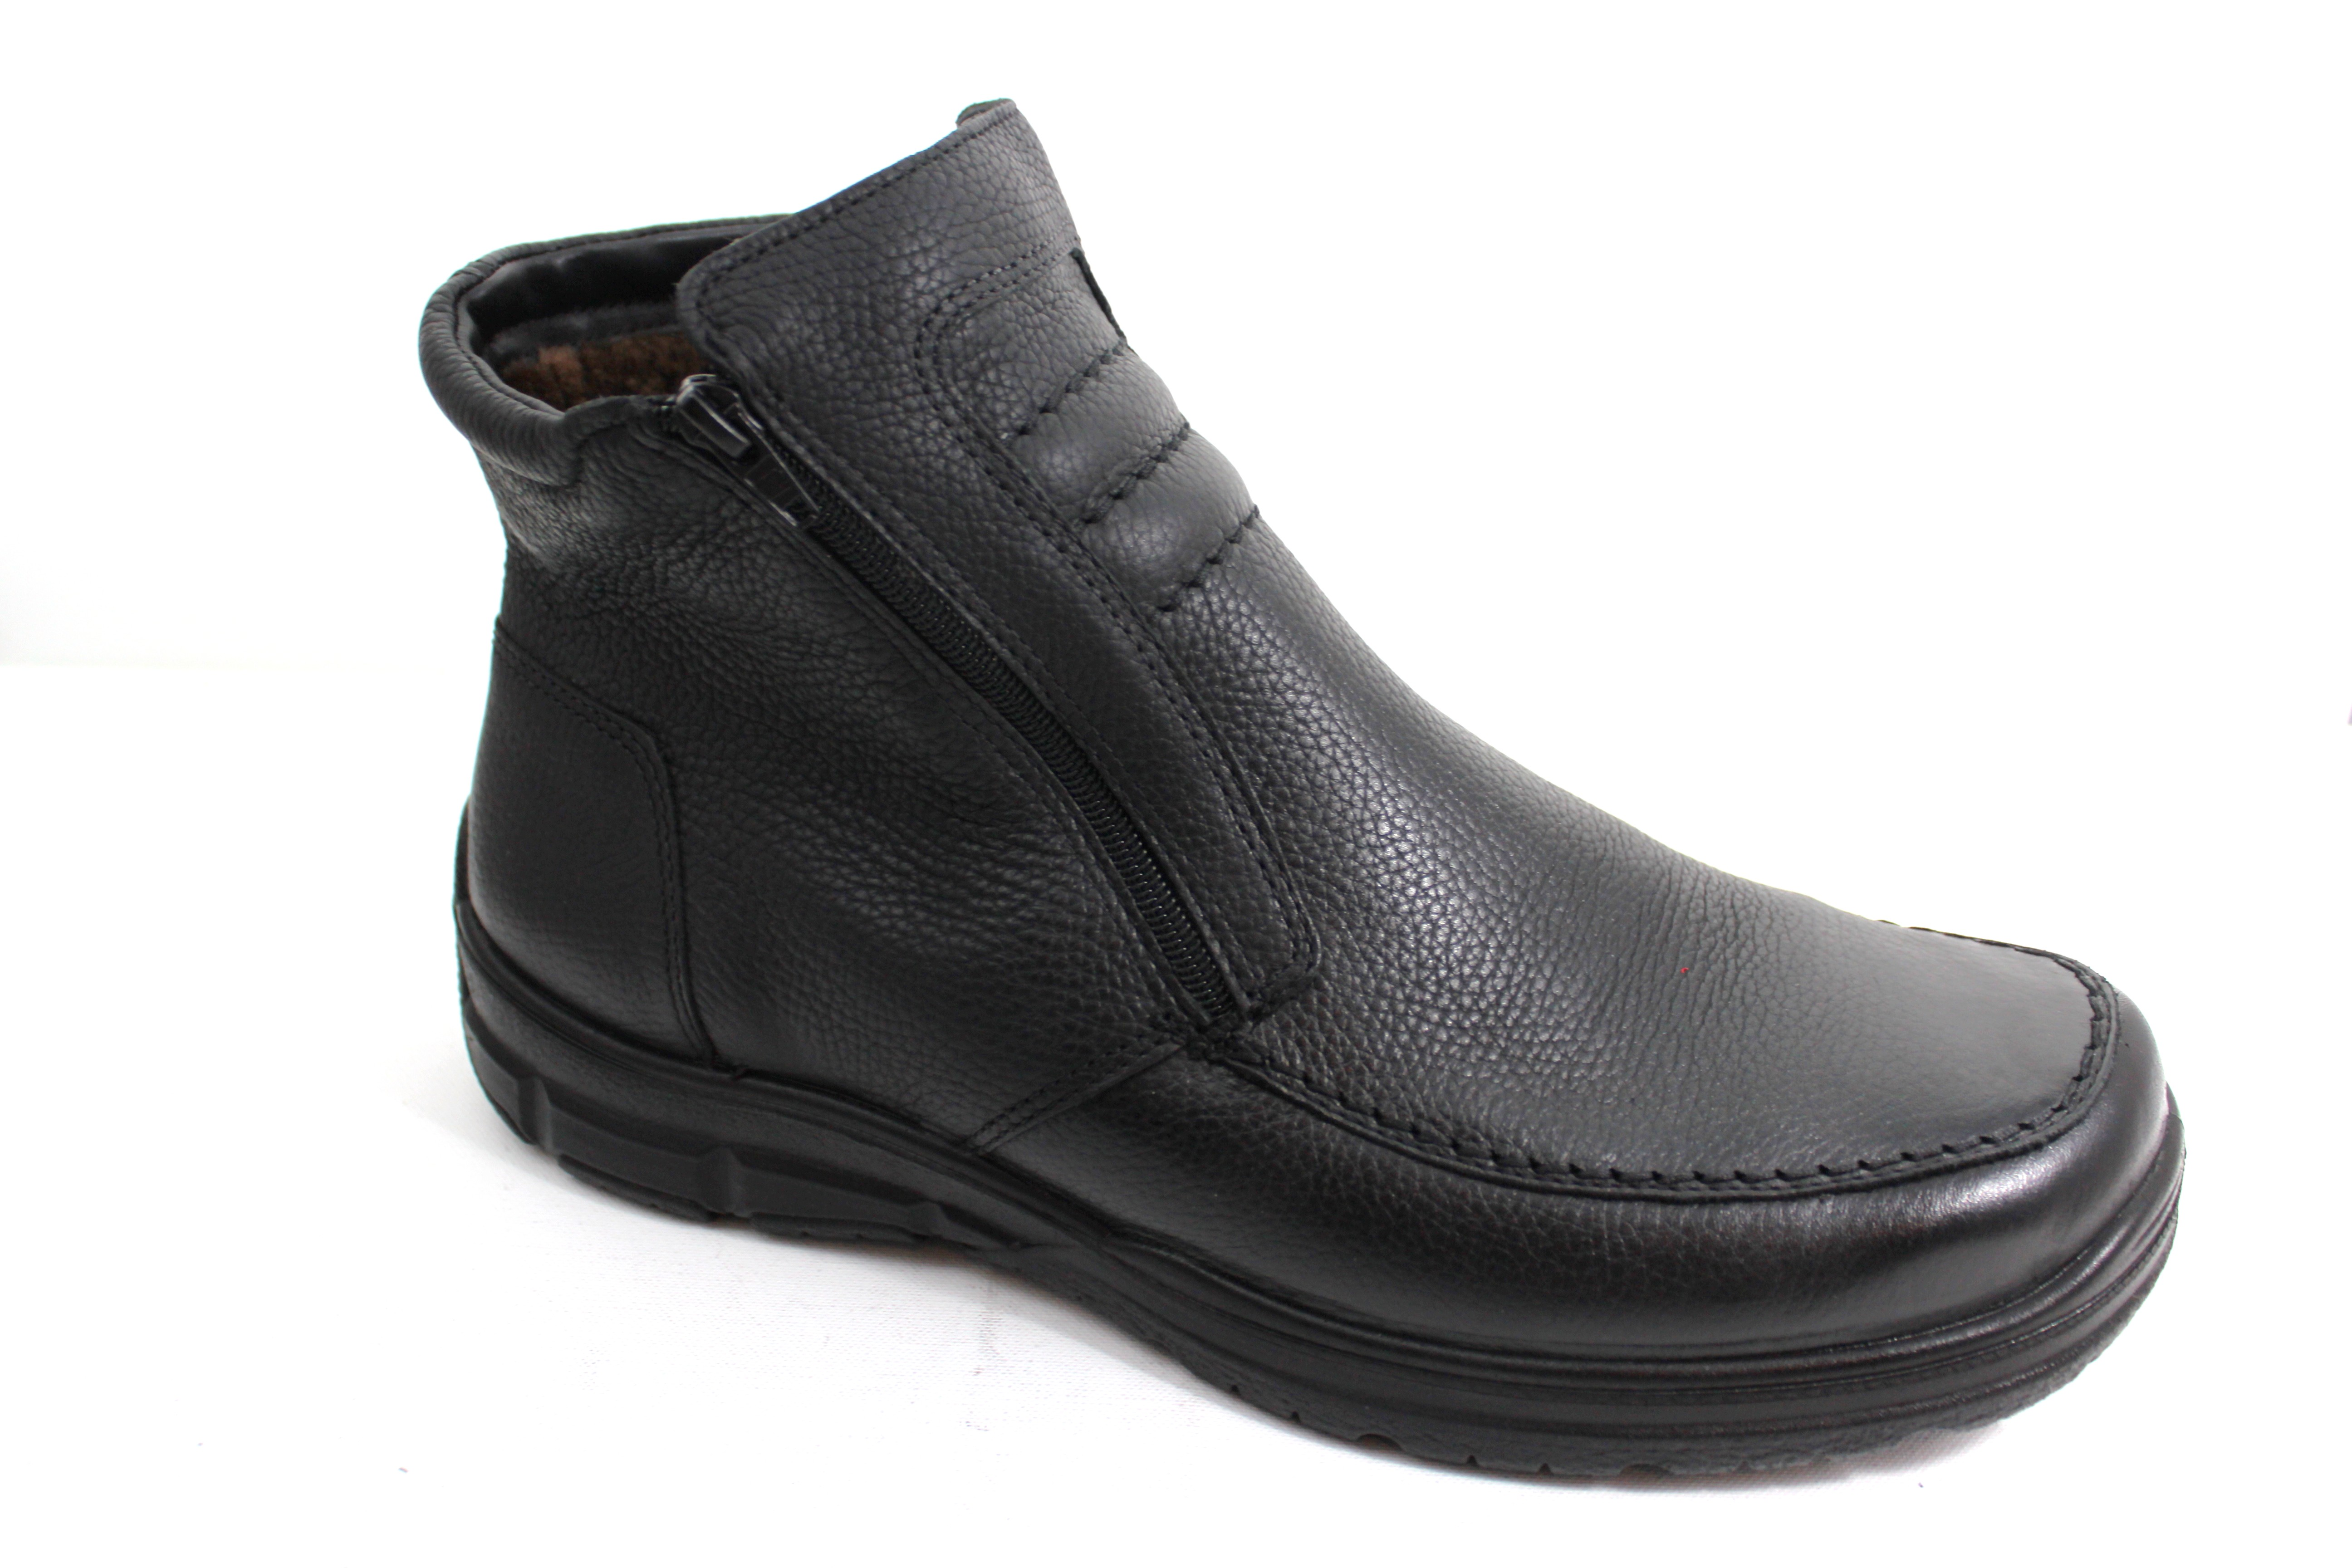 toscanini schuhe in ber und untergr en warmer boots 17001014 j 416501. Black Bedroom Furniture Sets. Home Design Ideas